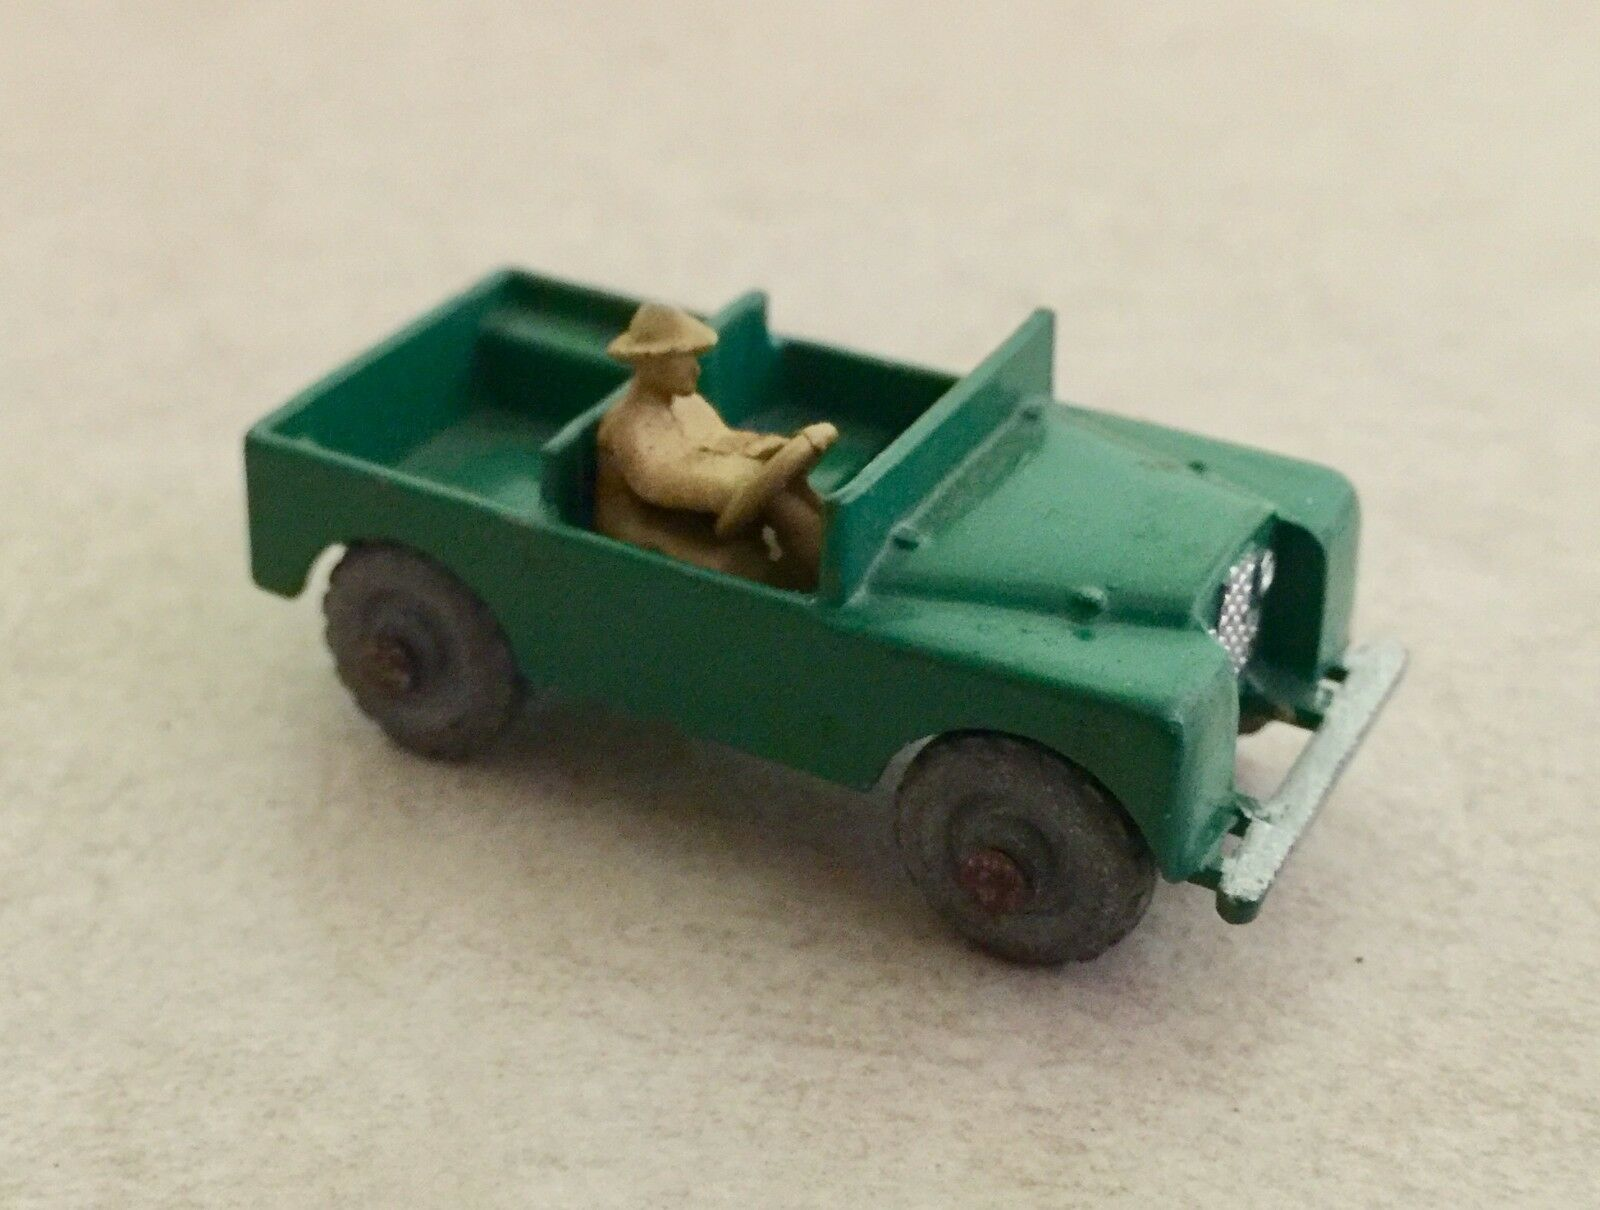 Rare Vintage Lesney Matchbox England Land Rover Green Safari Jeep a - Mint